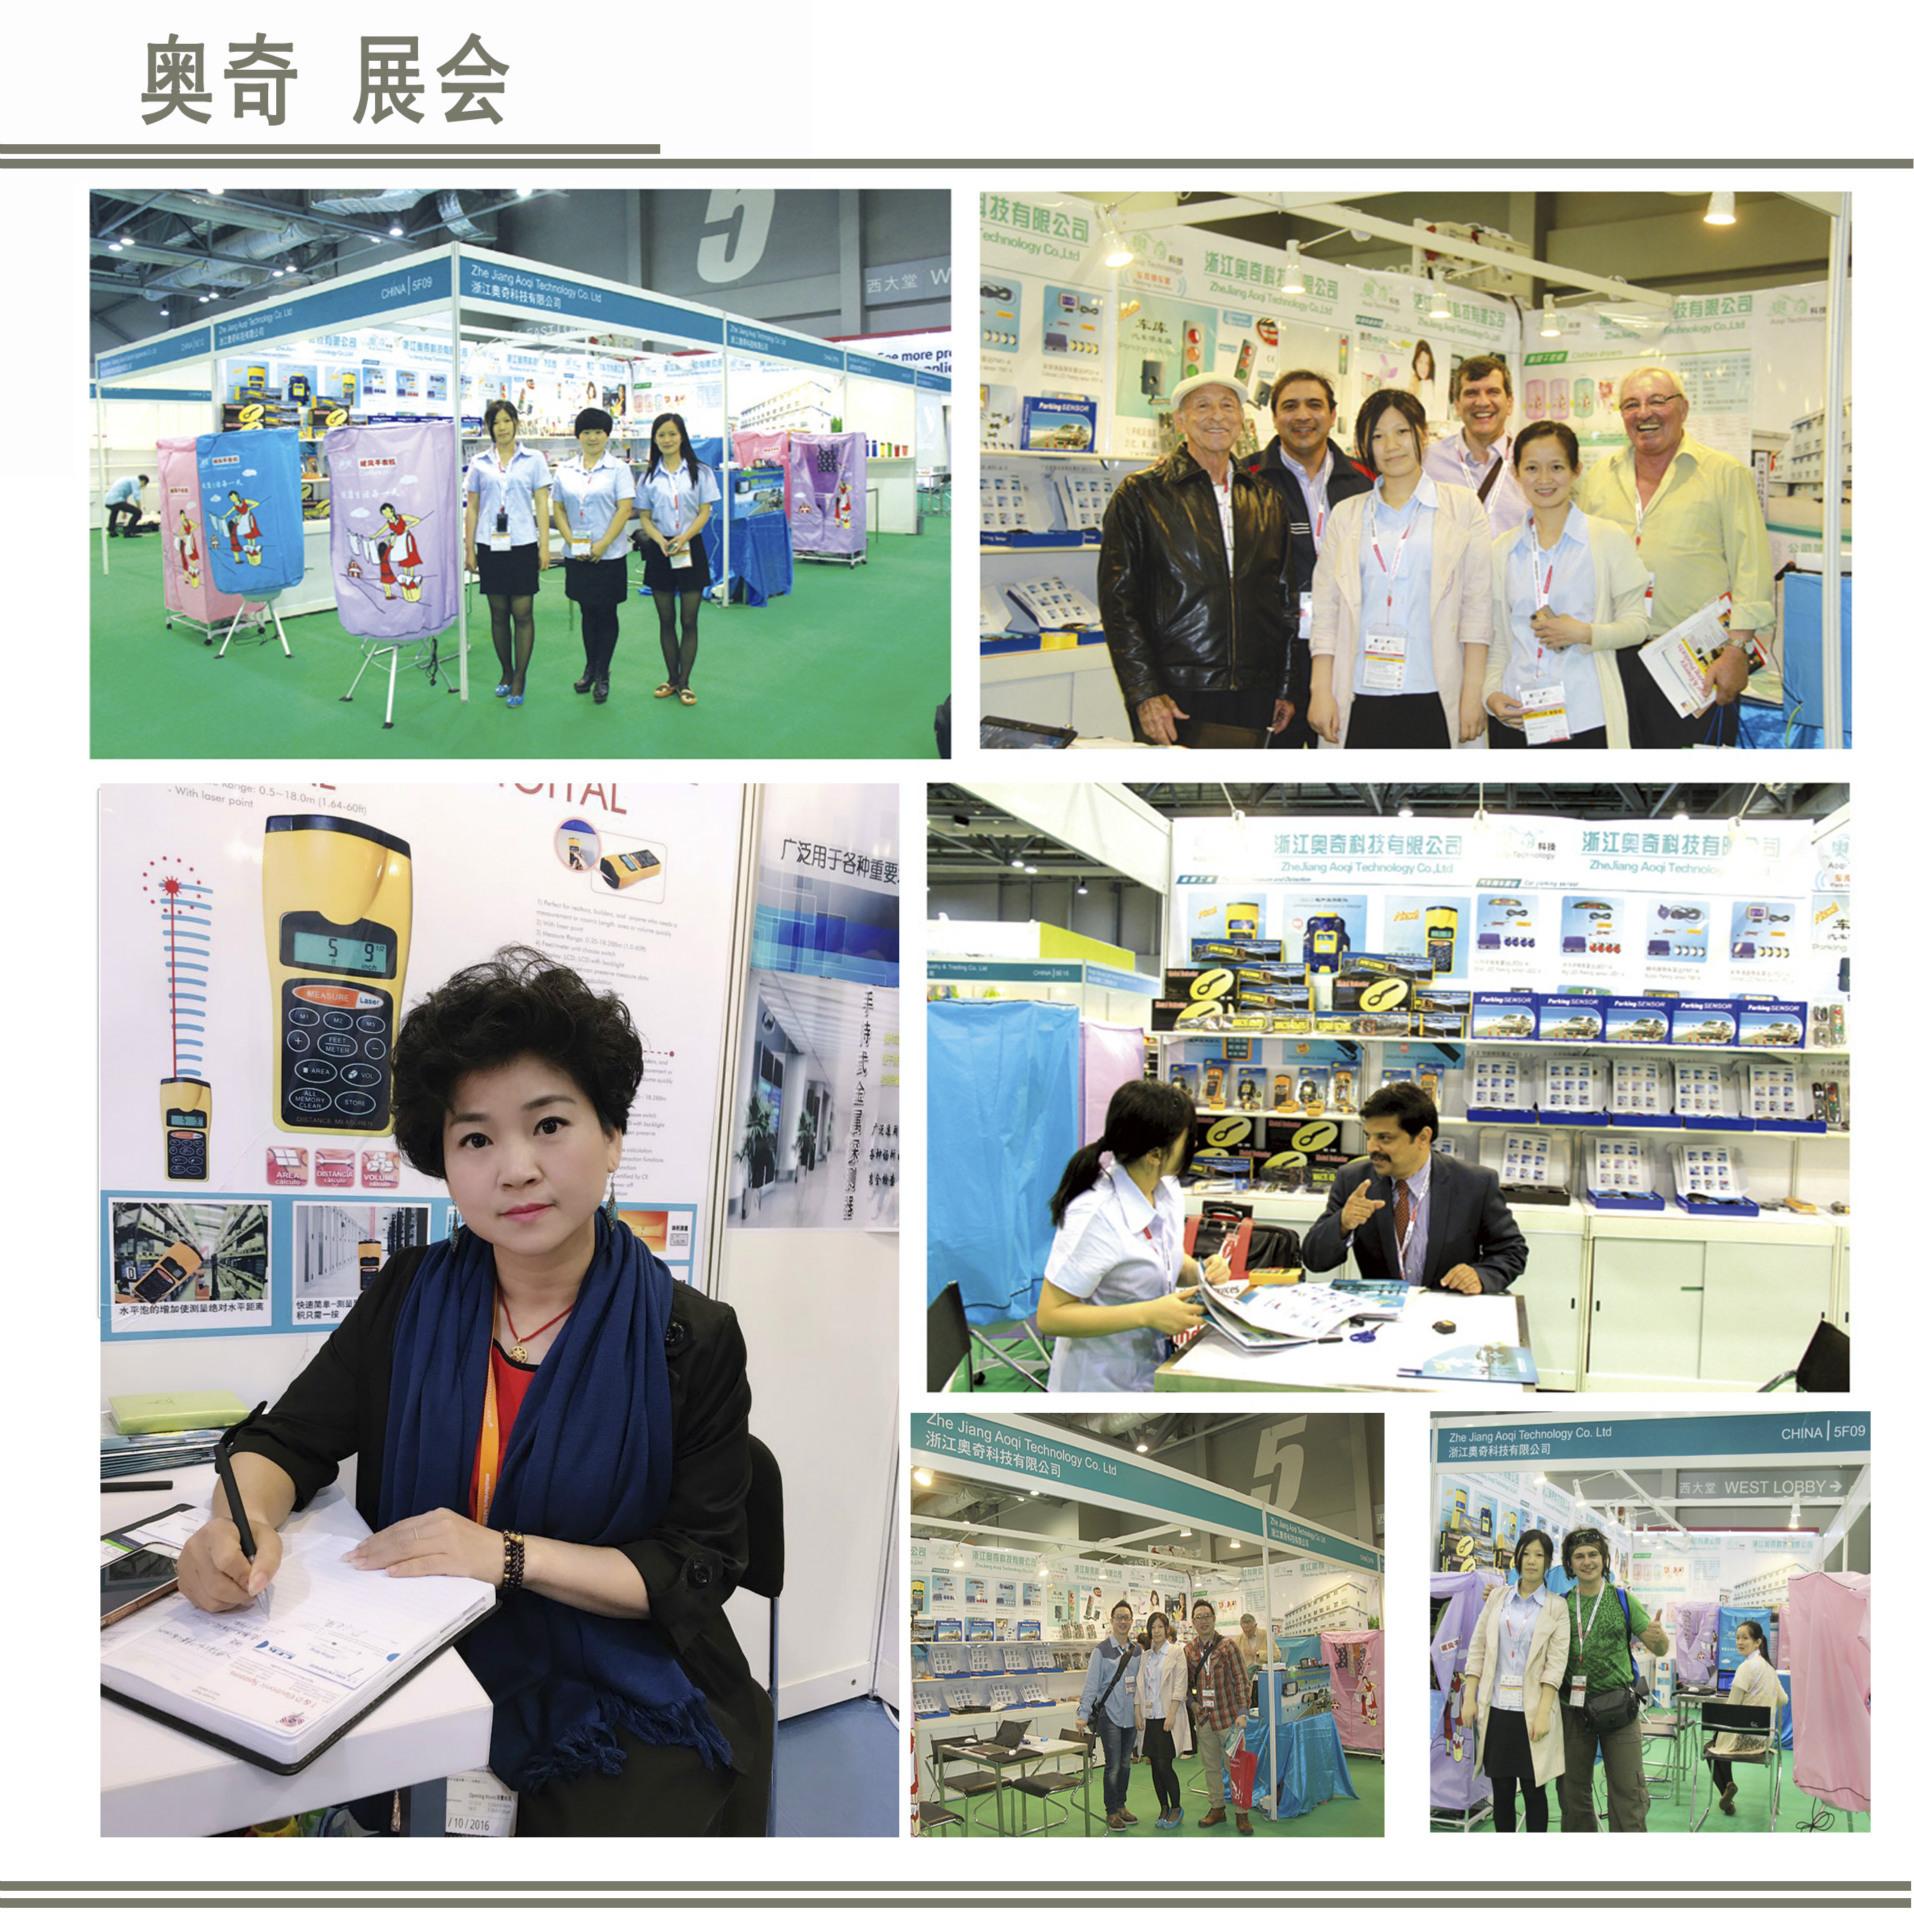 5Company Profiles-Exhibition